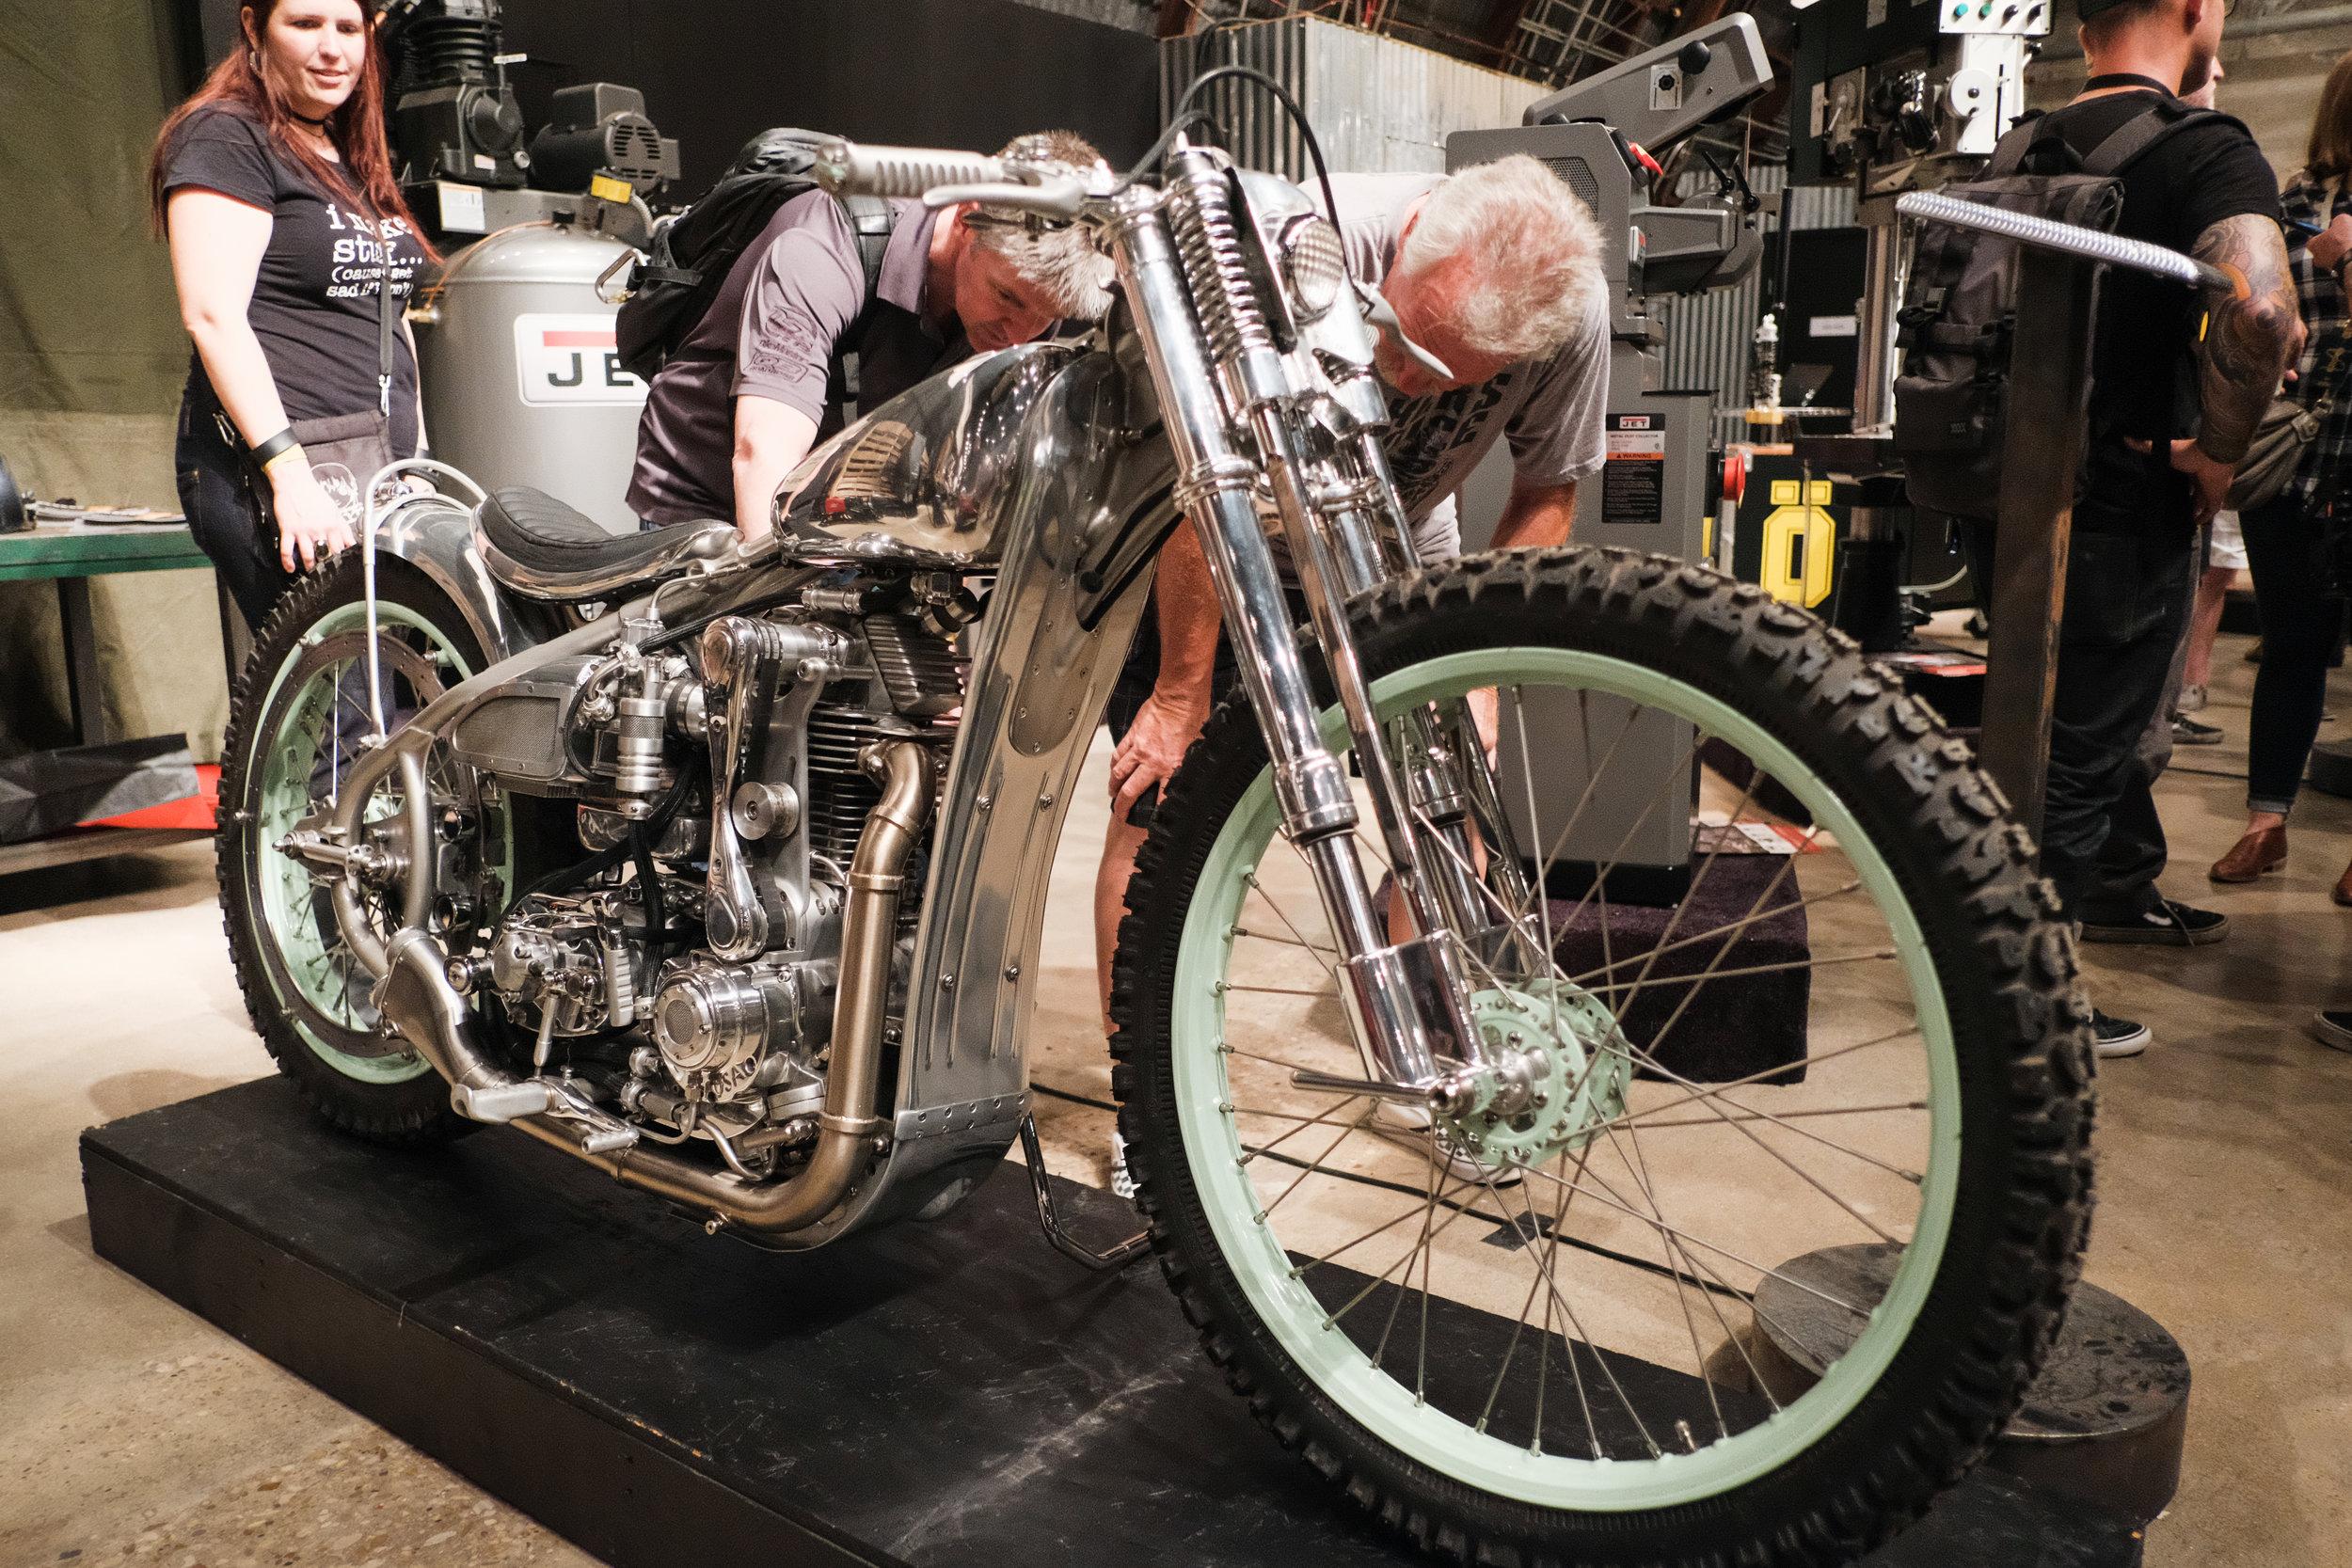 Handbuilt-Motorcycle-Show-2017-8679.jpg